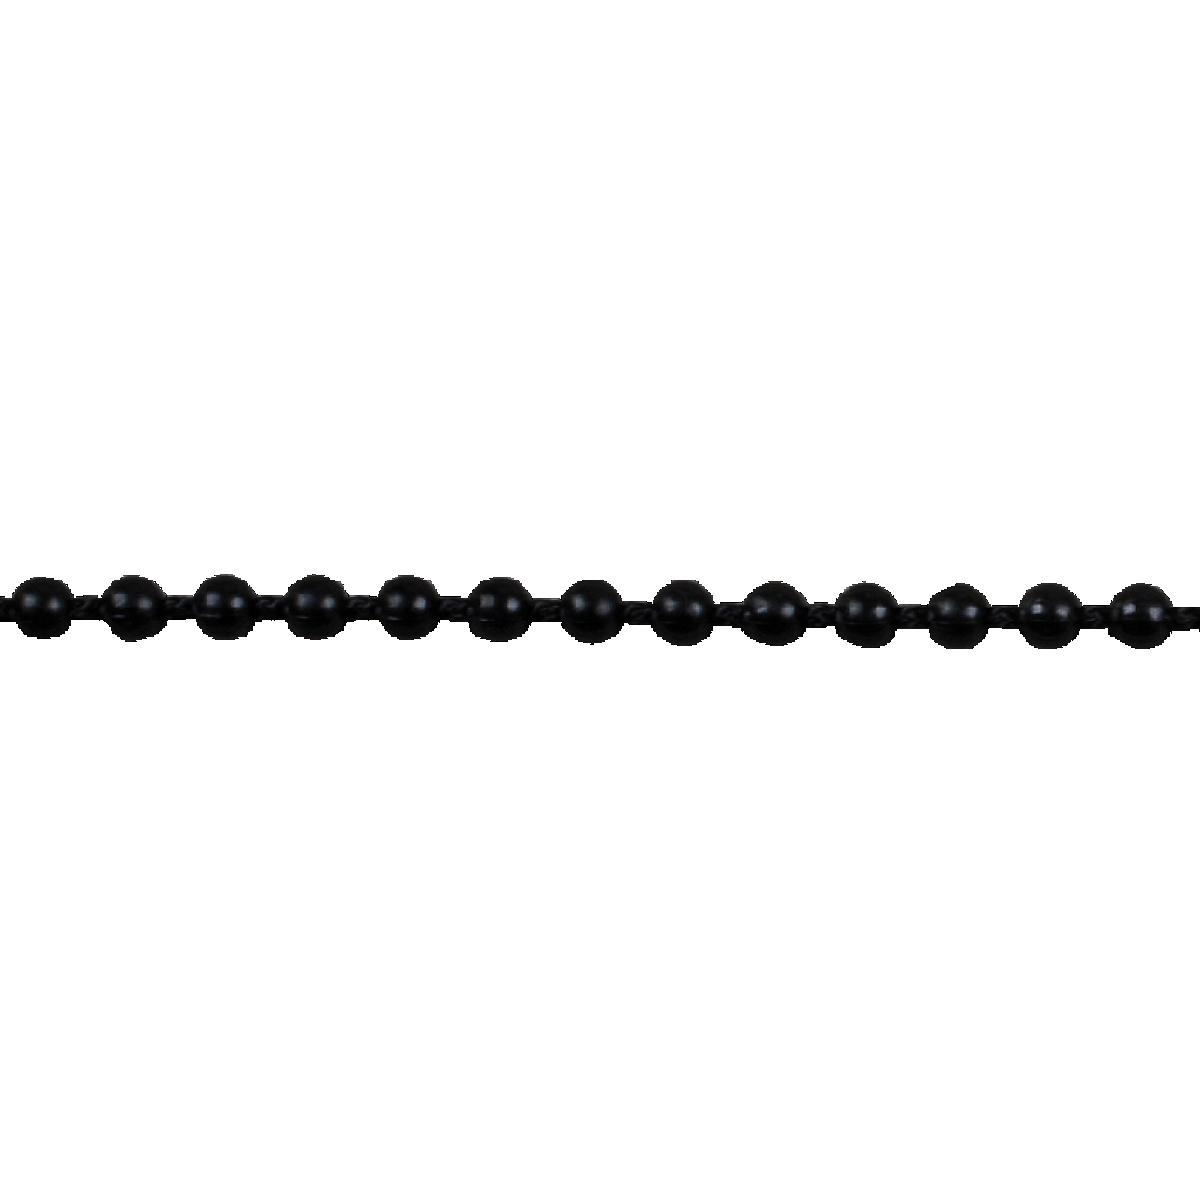 Continuous Plastic Bead Chain, 5' drop Black